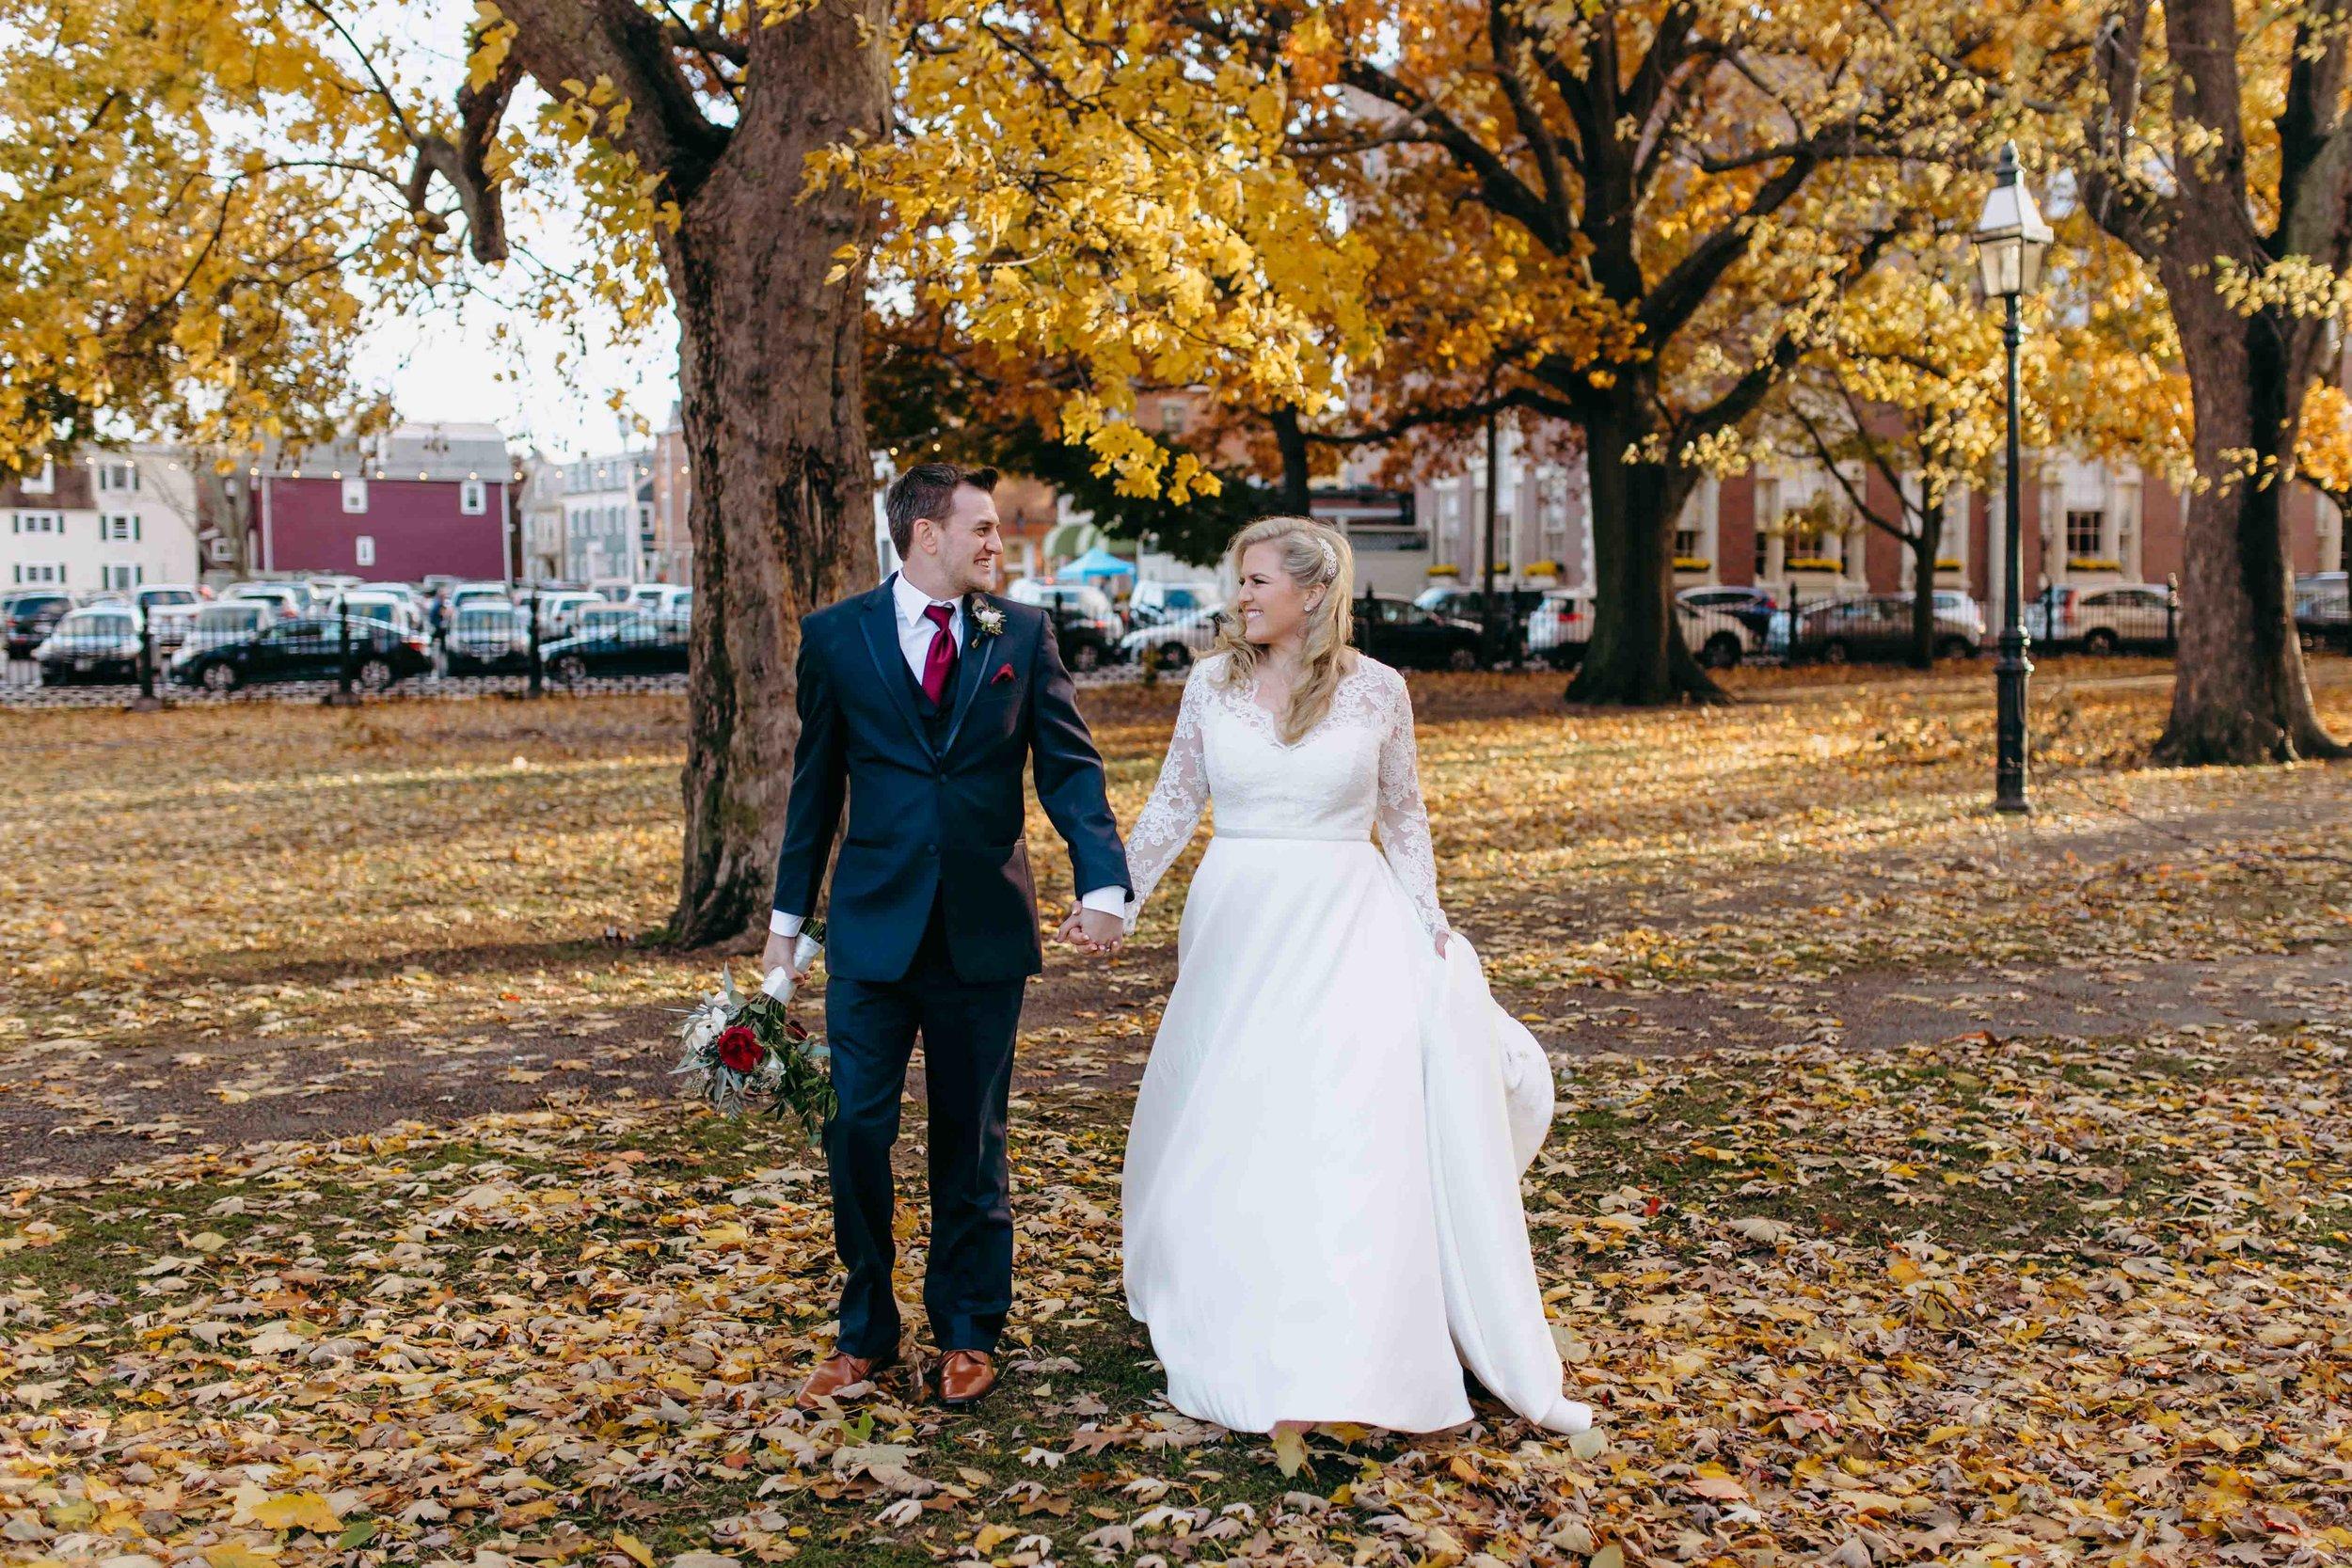 11-03-18_Stadnick Wedding_206.jpg